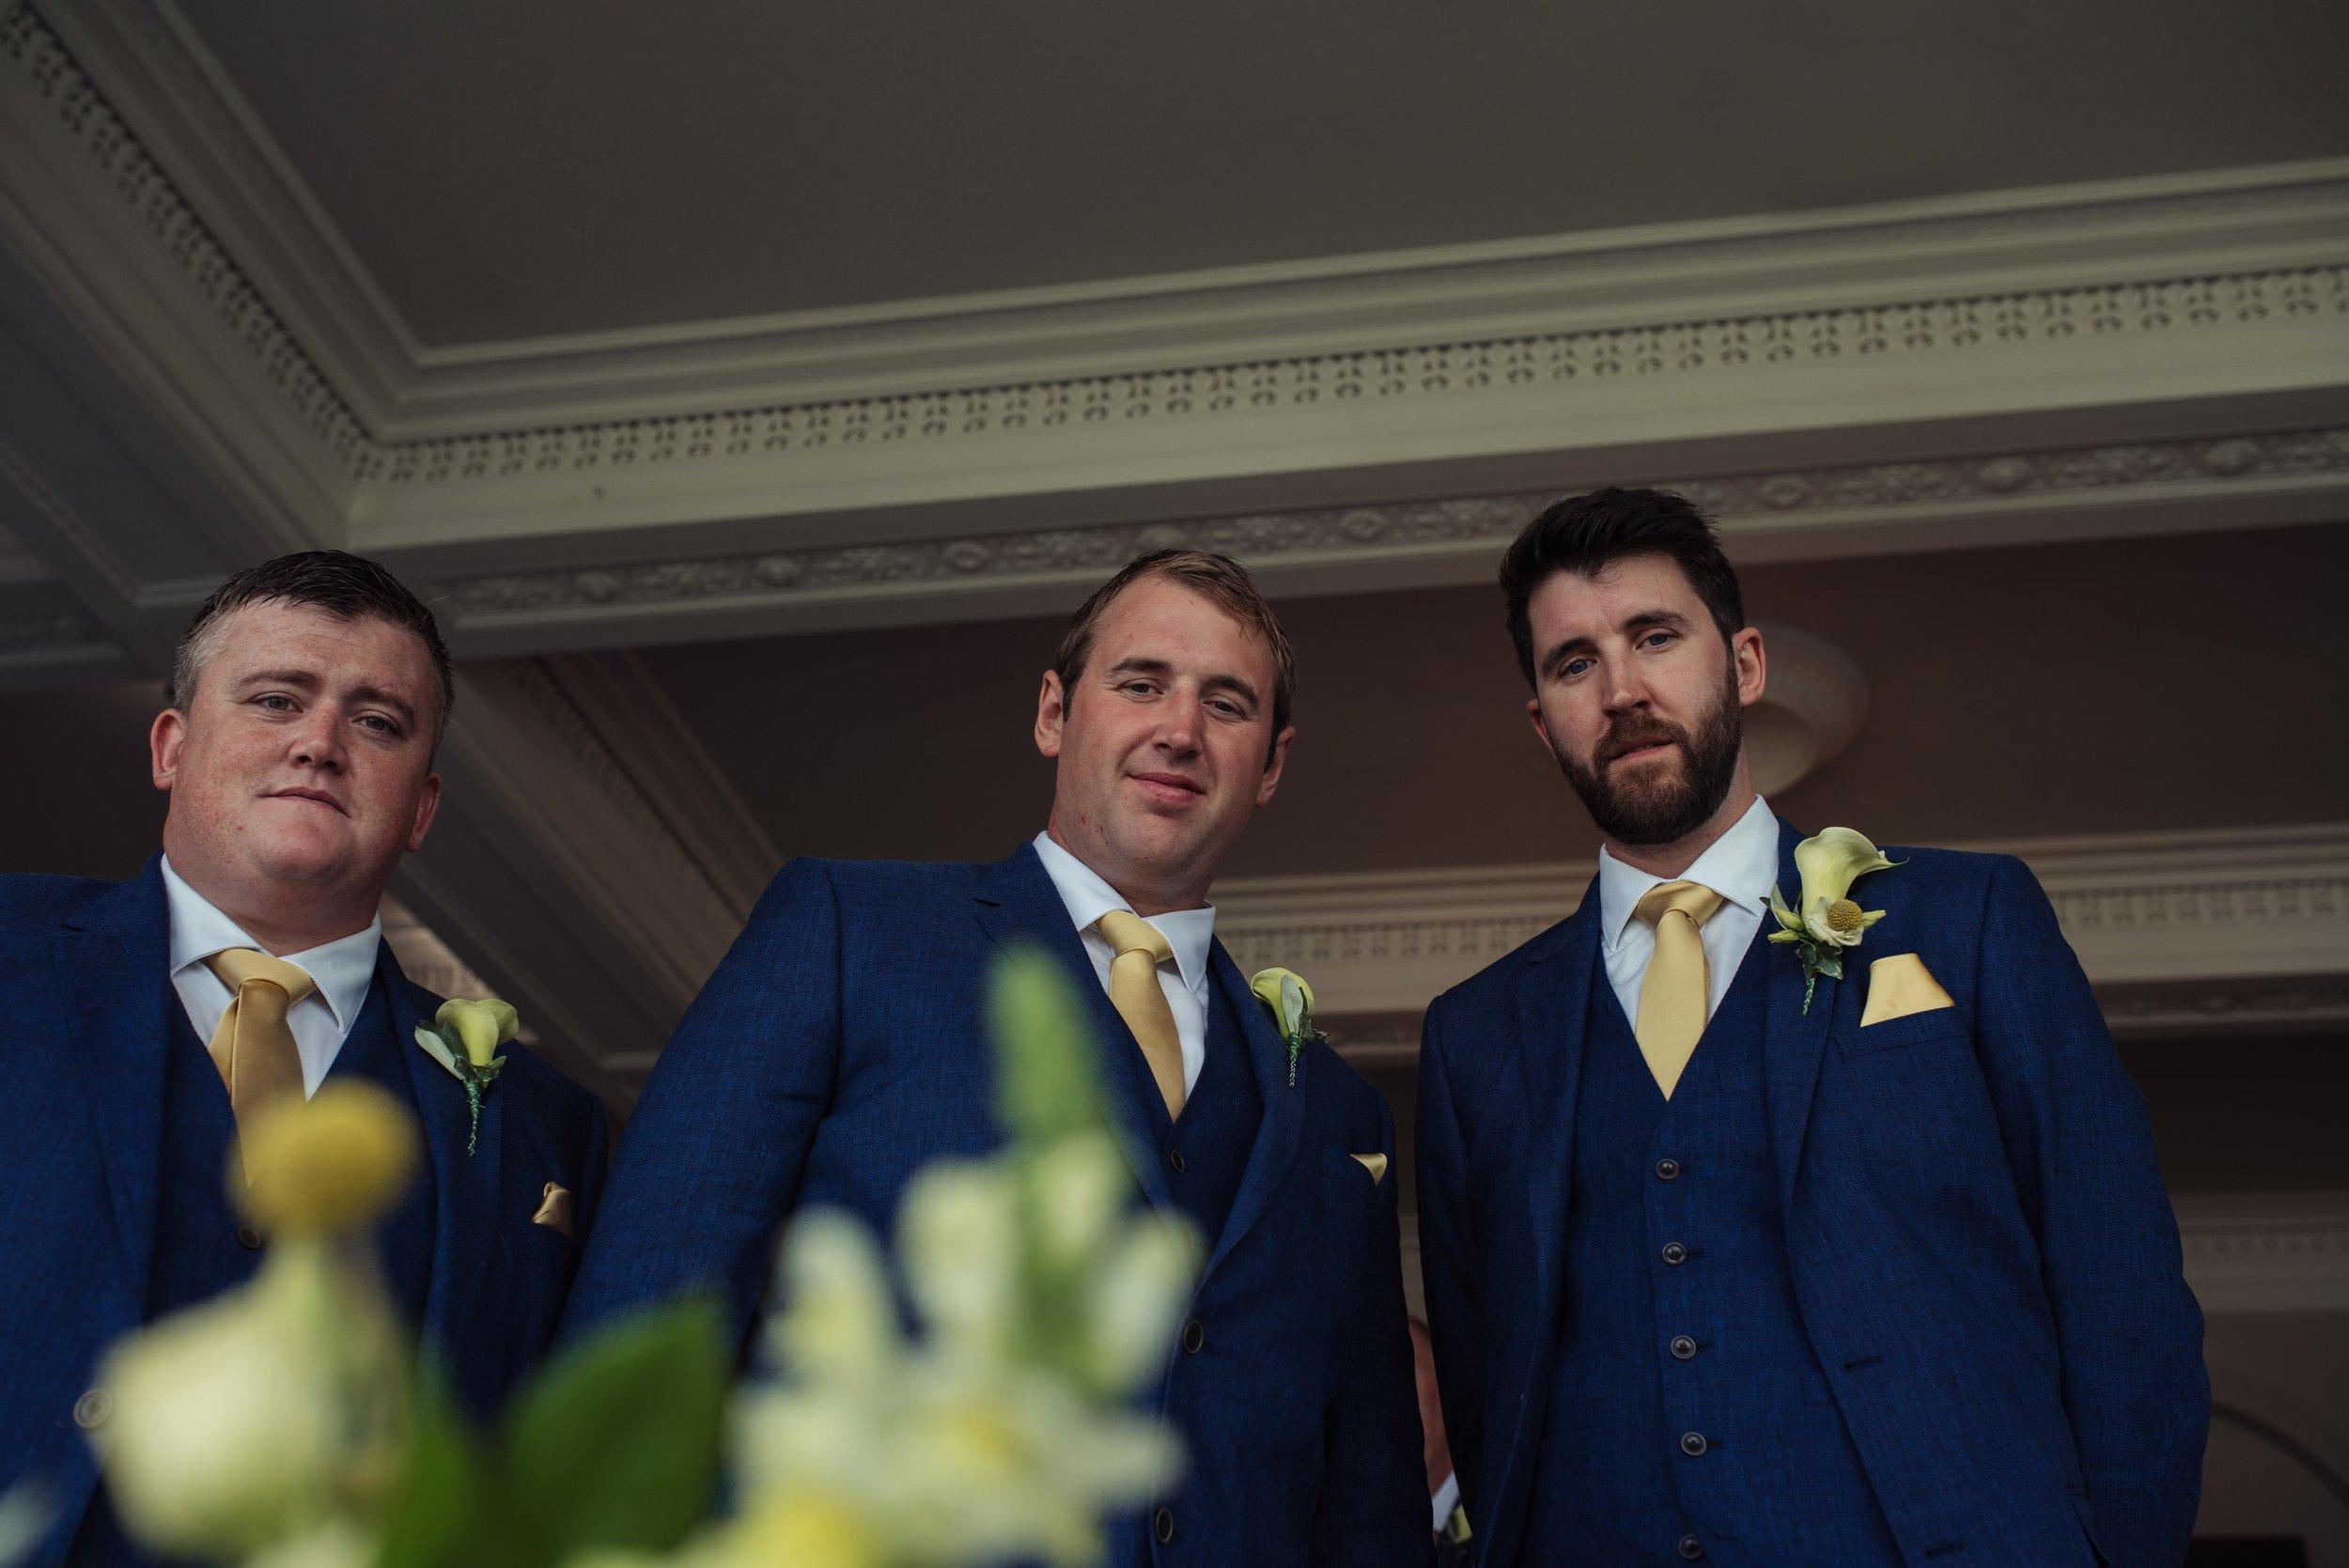 Belsfield Wedding Photography-29.jpg